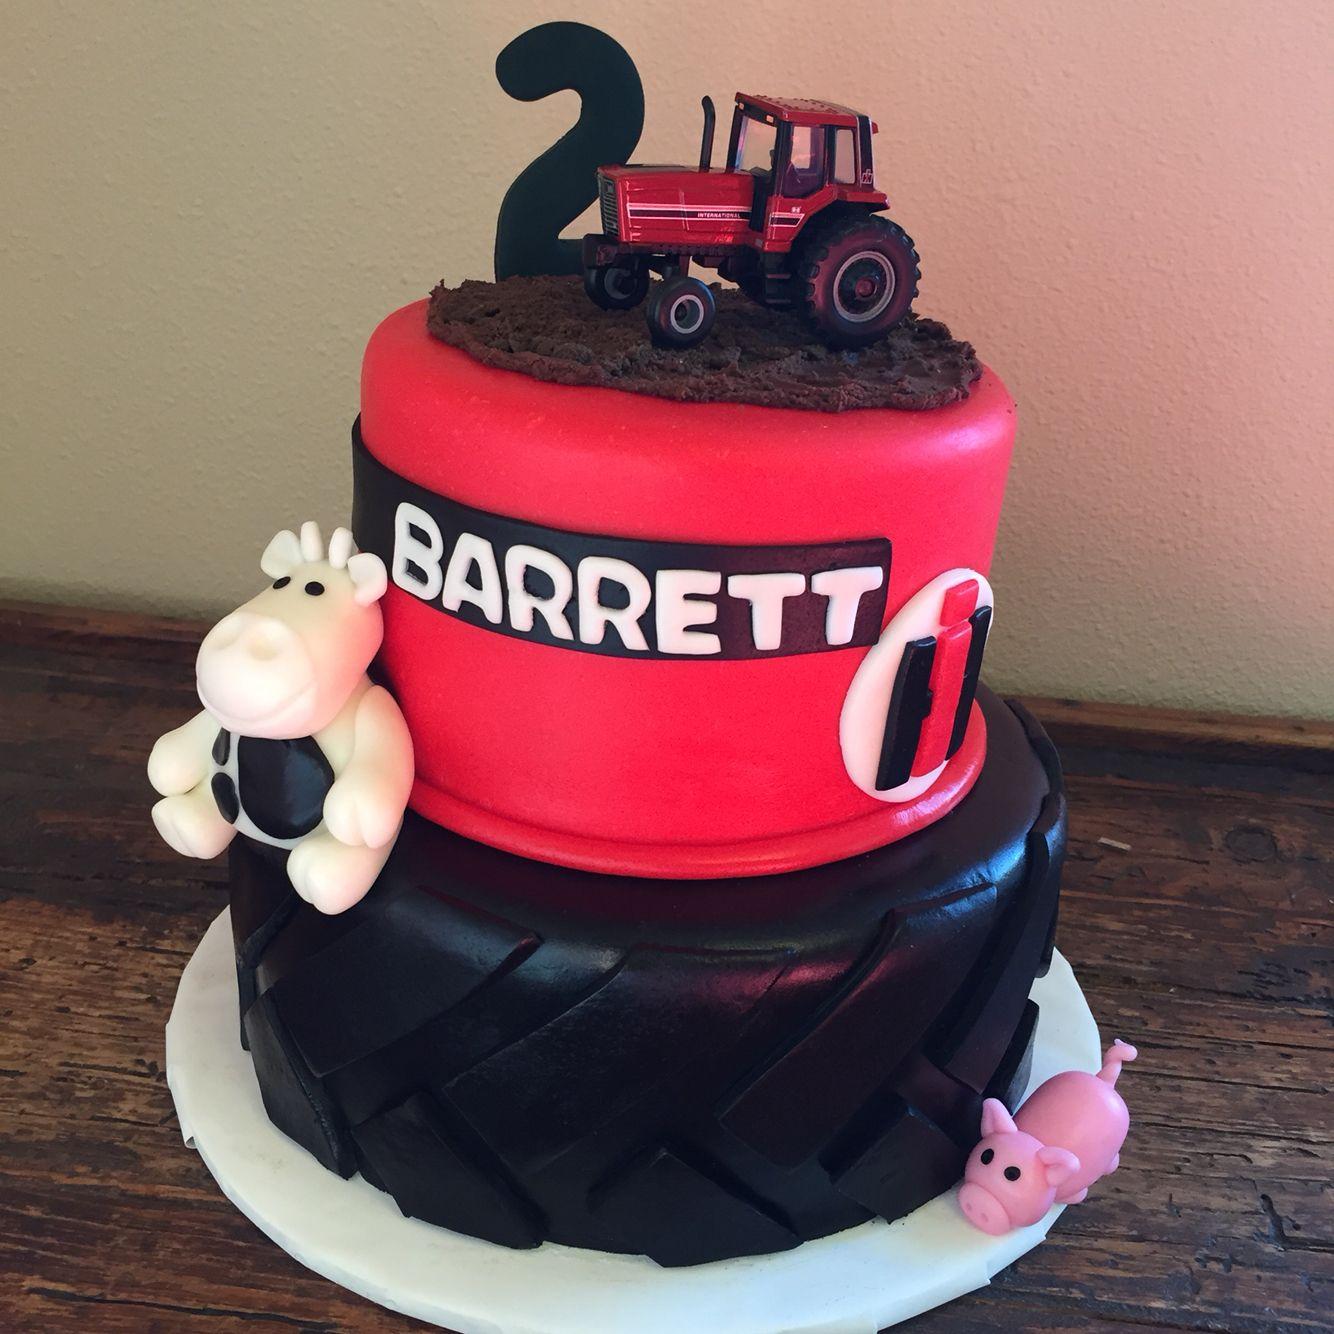 Case Ih Red Tractor Birthday Cake It Was A Huge Hit Tractor Birthday Cakes Red Tractor Birthday Baby Boy Birthday Cake